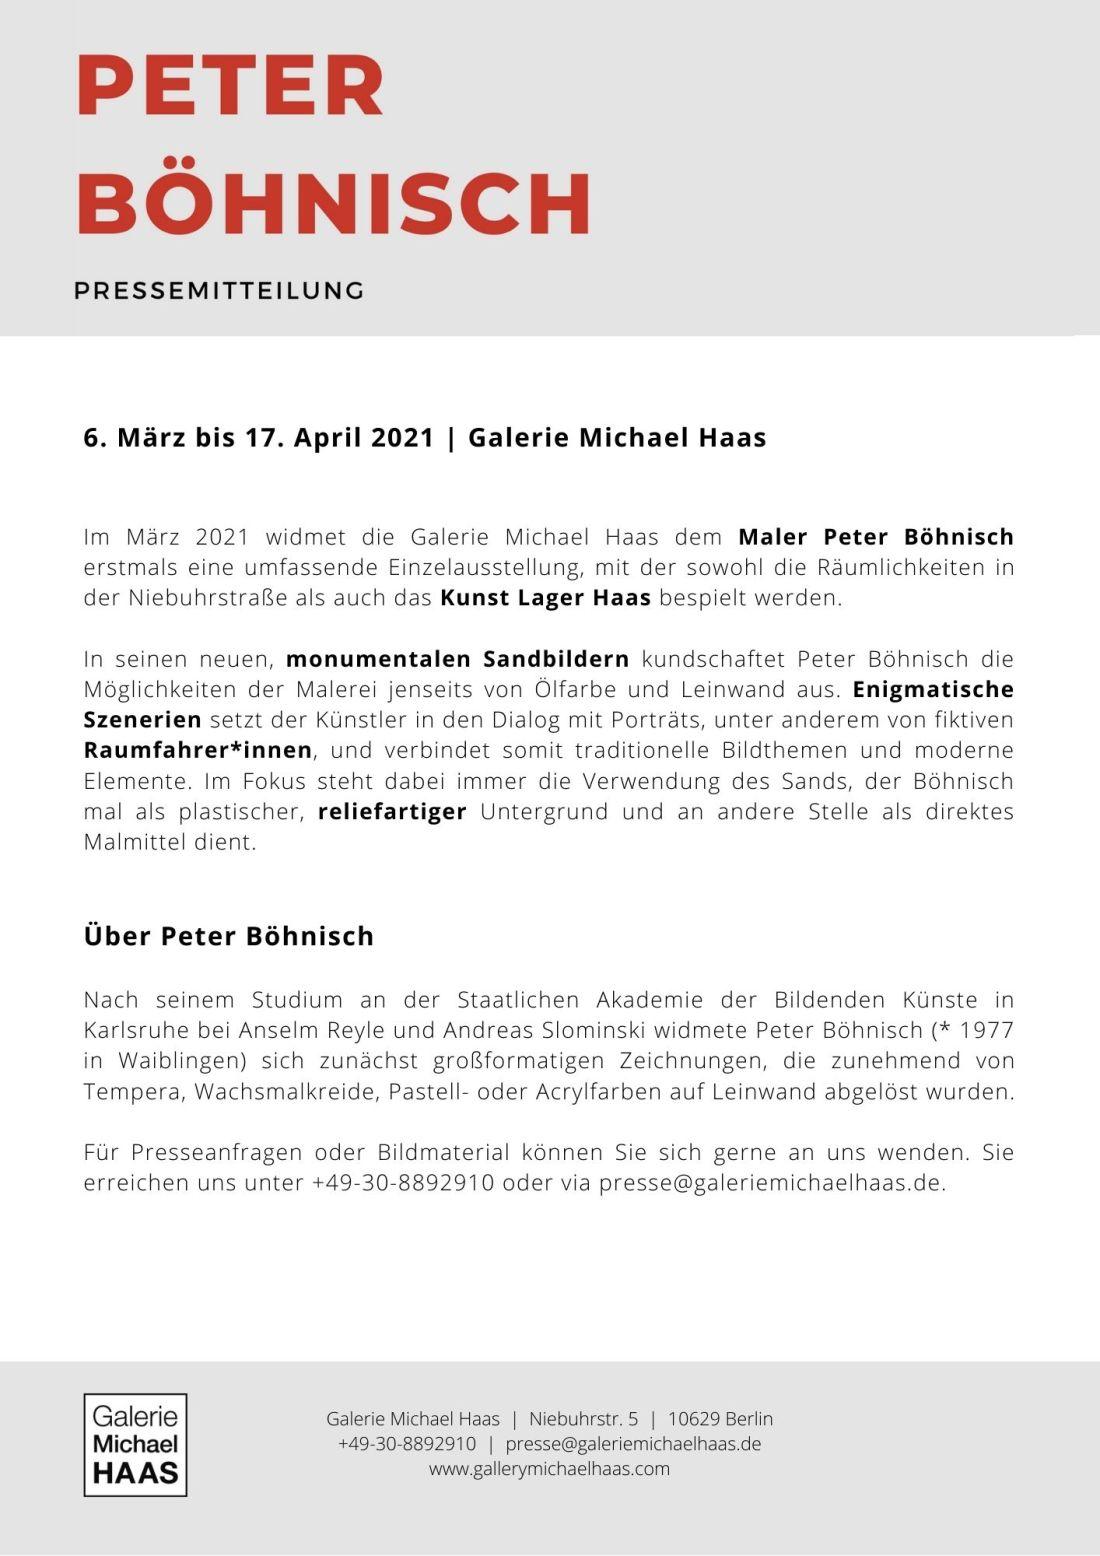 Pressemitteilung Peter Böhnsich